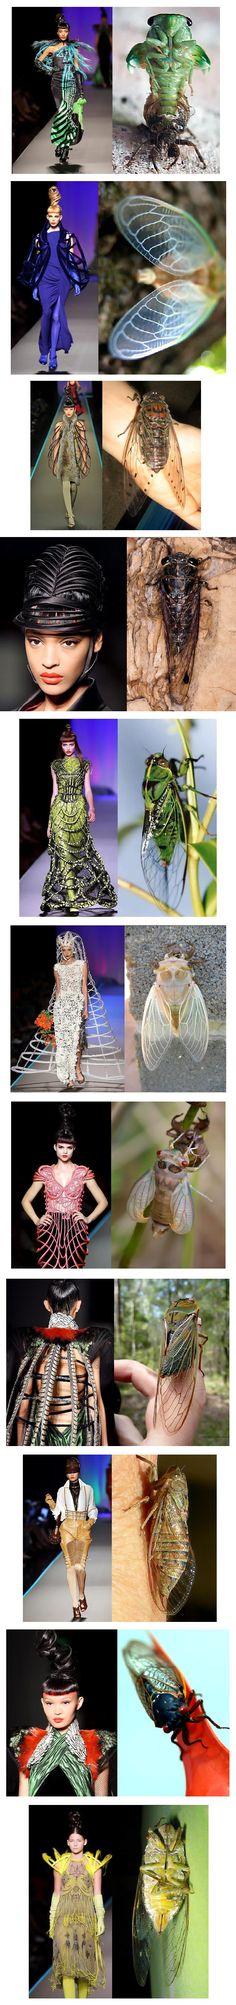 ❣Jean Paul Gaultier   Metamorphosis 2014 article butterflies galore Jean Paul Gaultier Spring Couture 2014